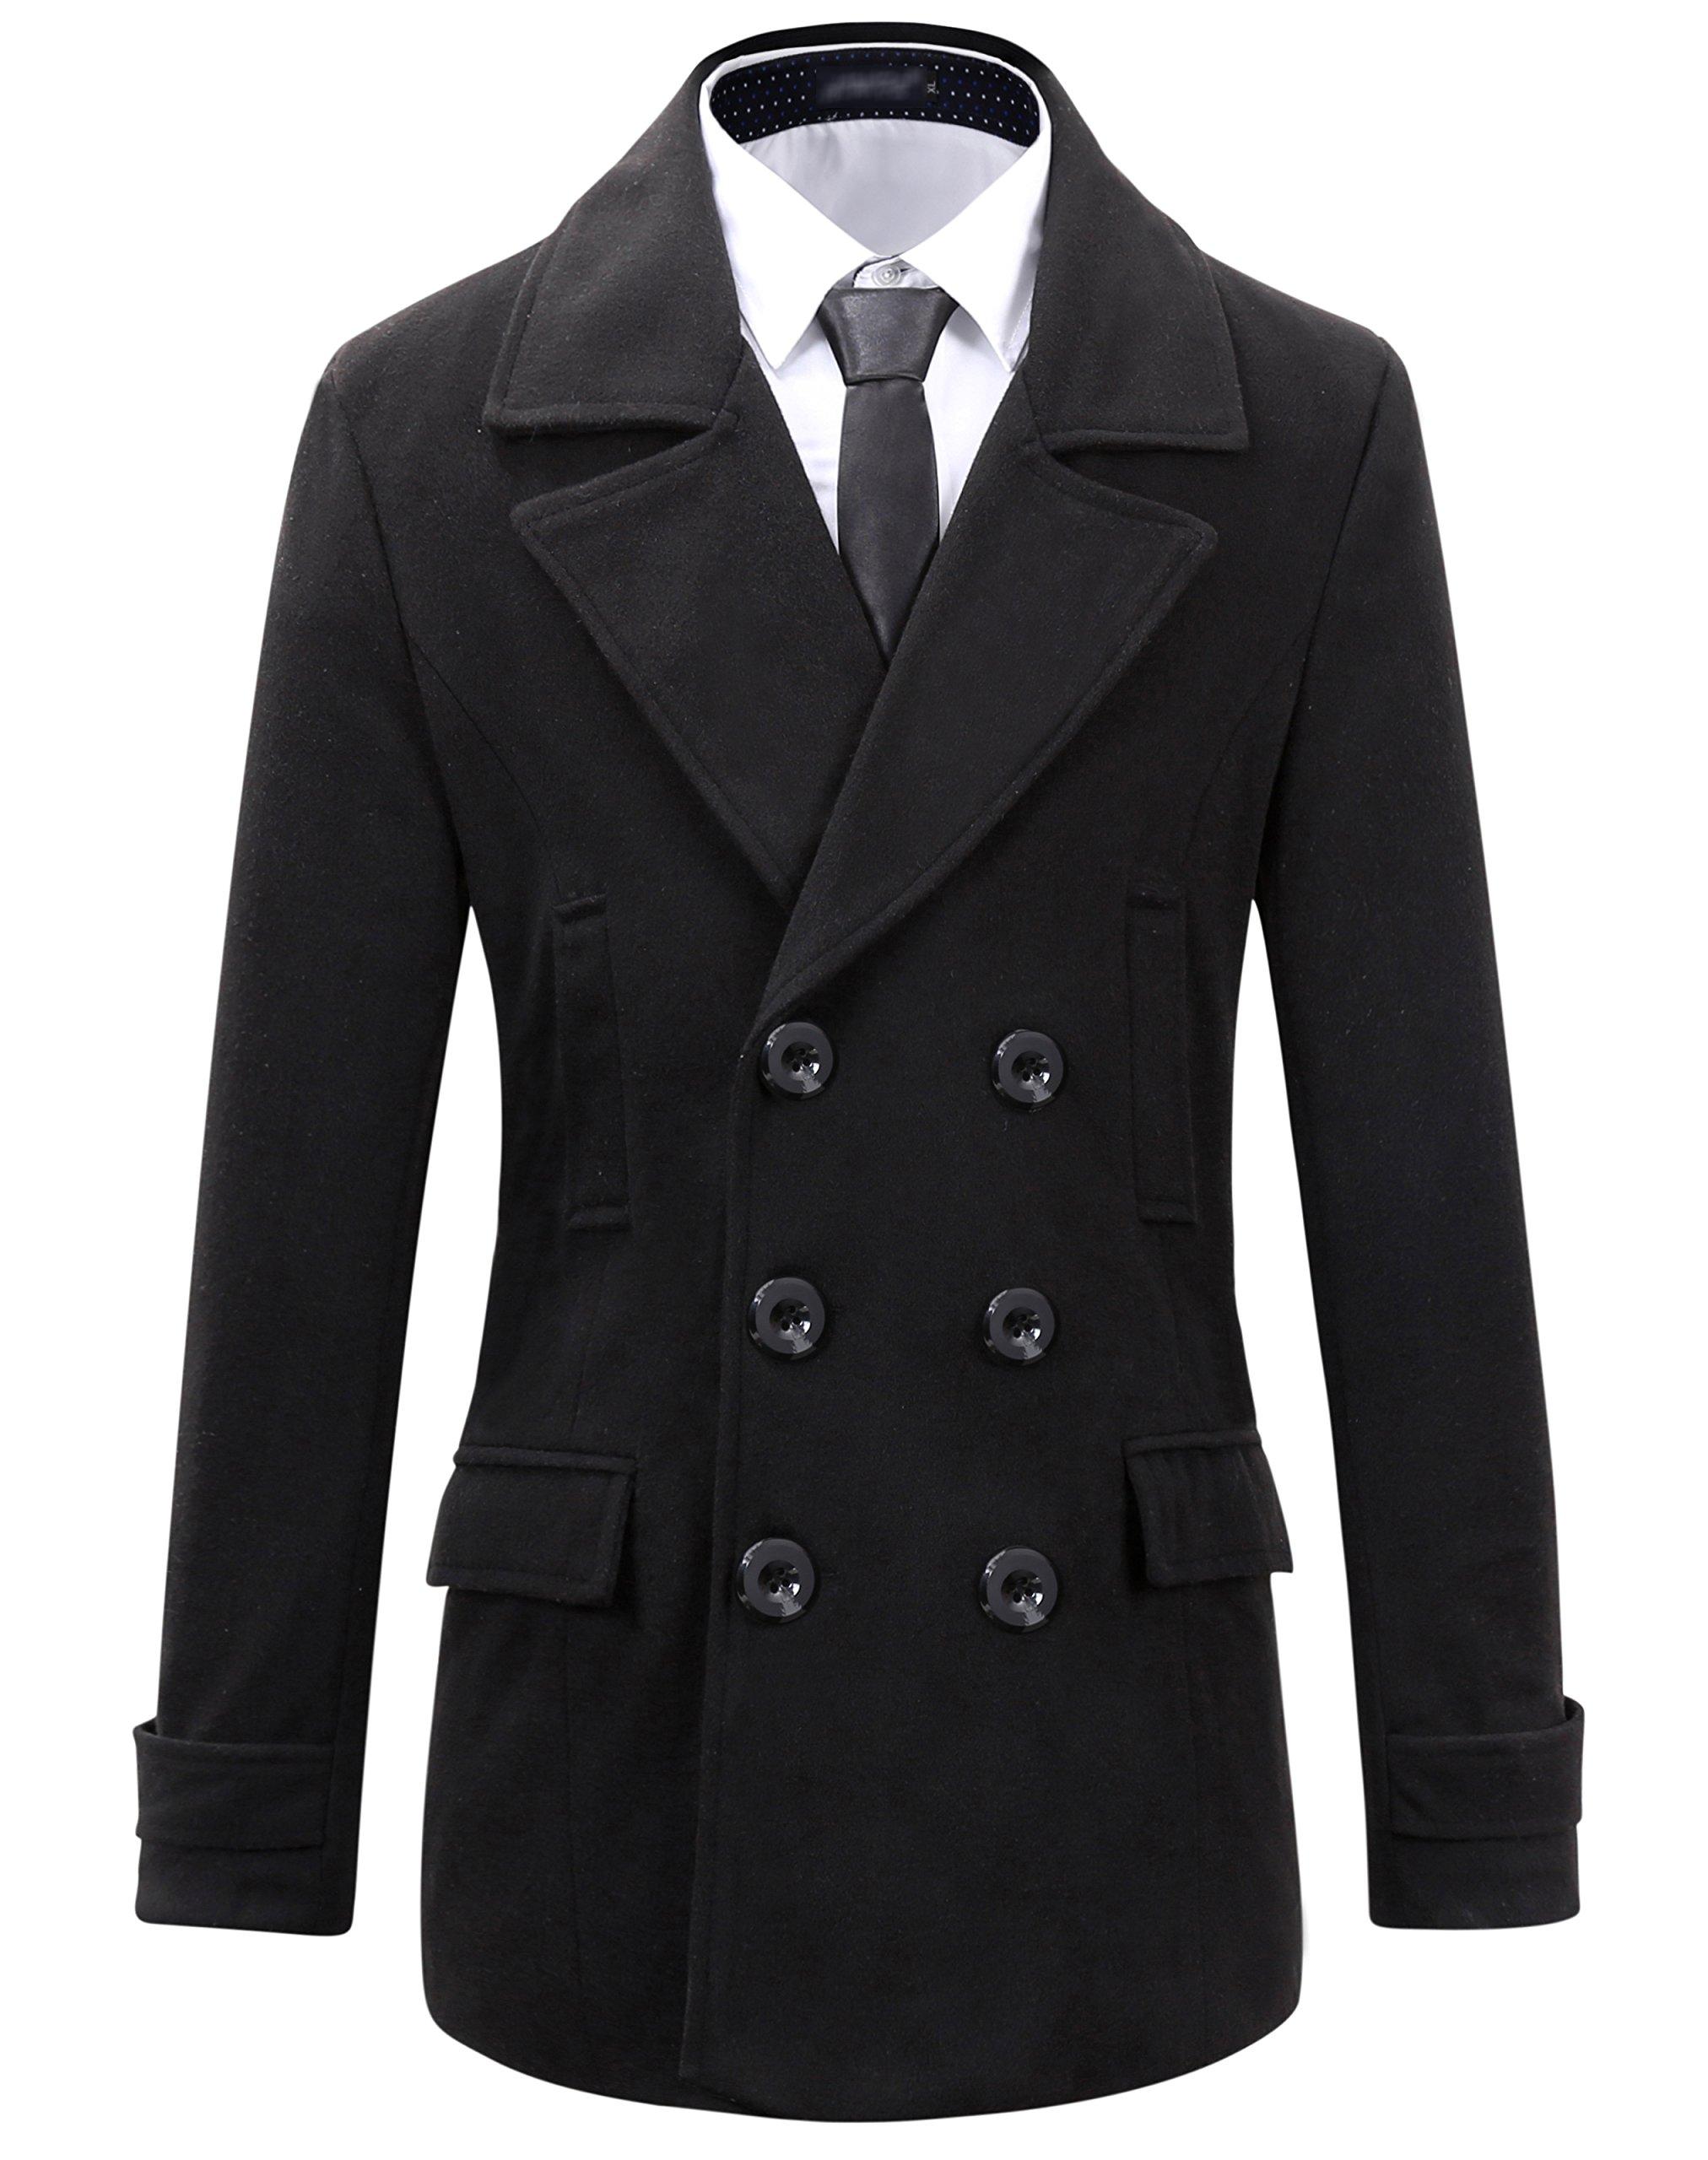 Beninos Mens Wool Slim Fit Double Breasted Half Trench Coat (0051, Black, XL) by Beninos